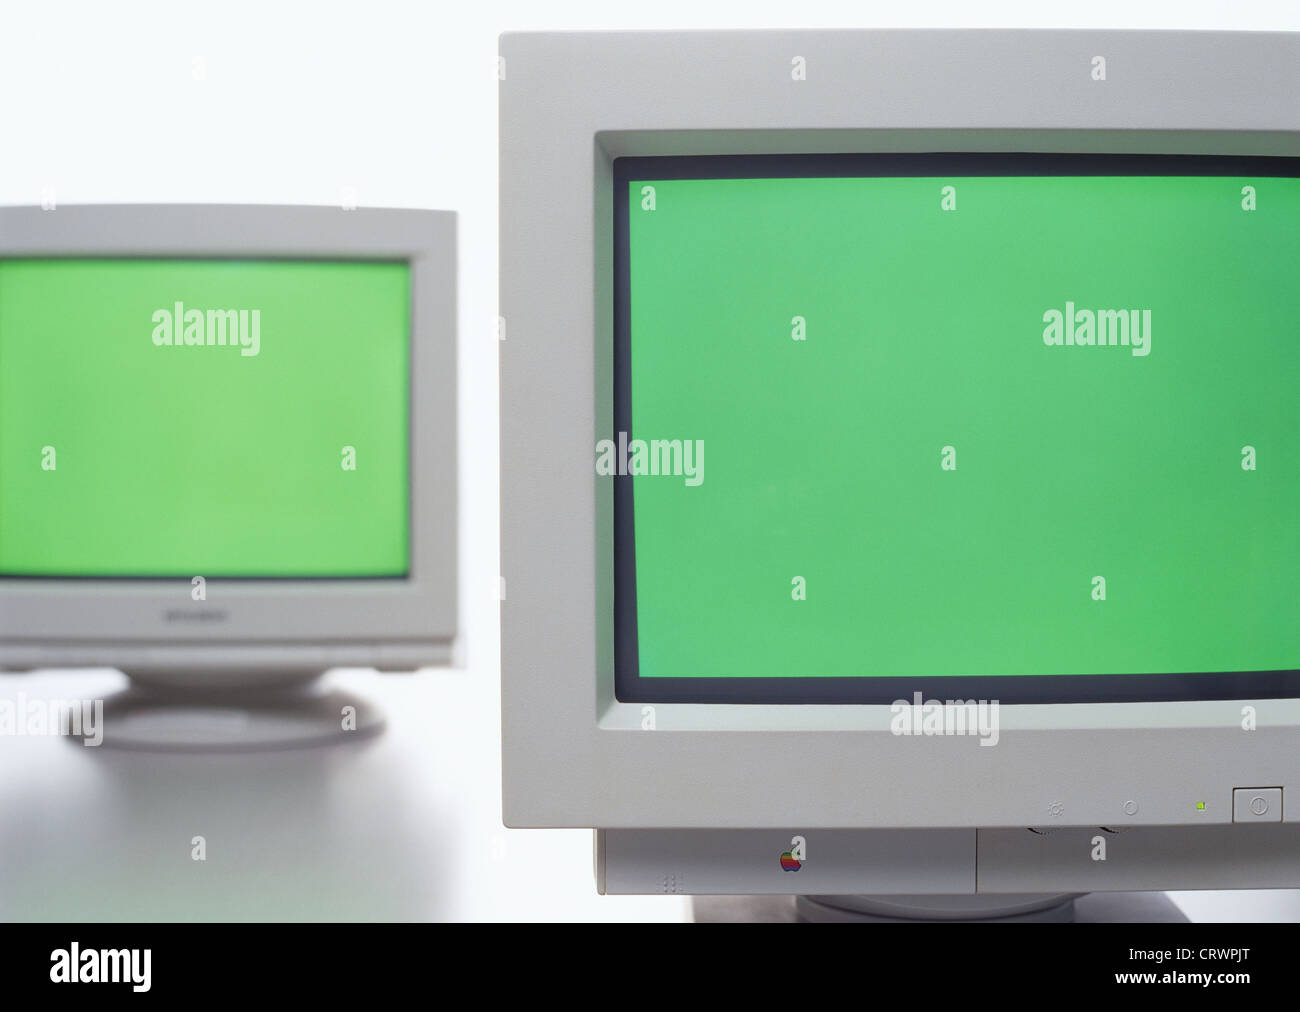 Old Crt Monitor Screen Display Stock Photo   Alamy